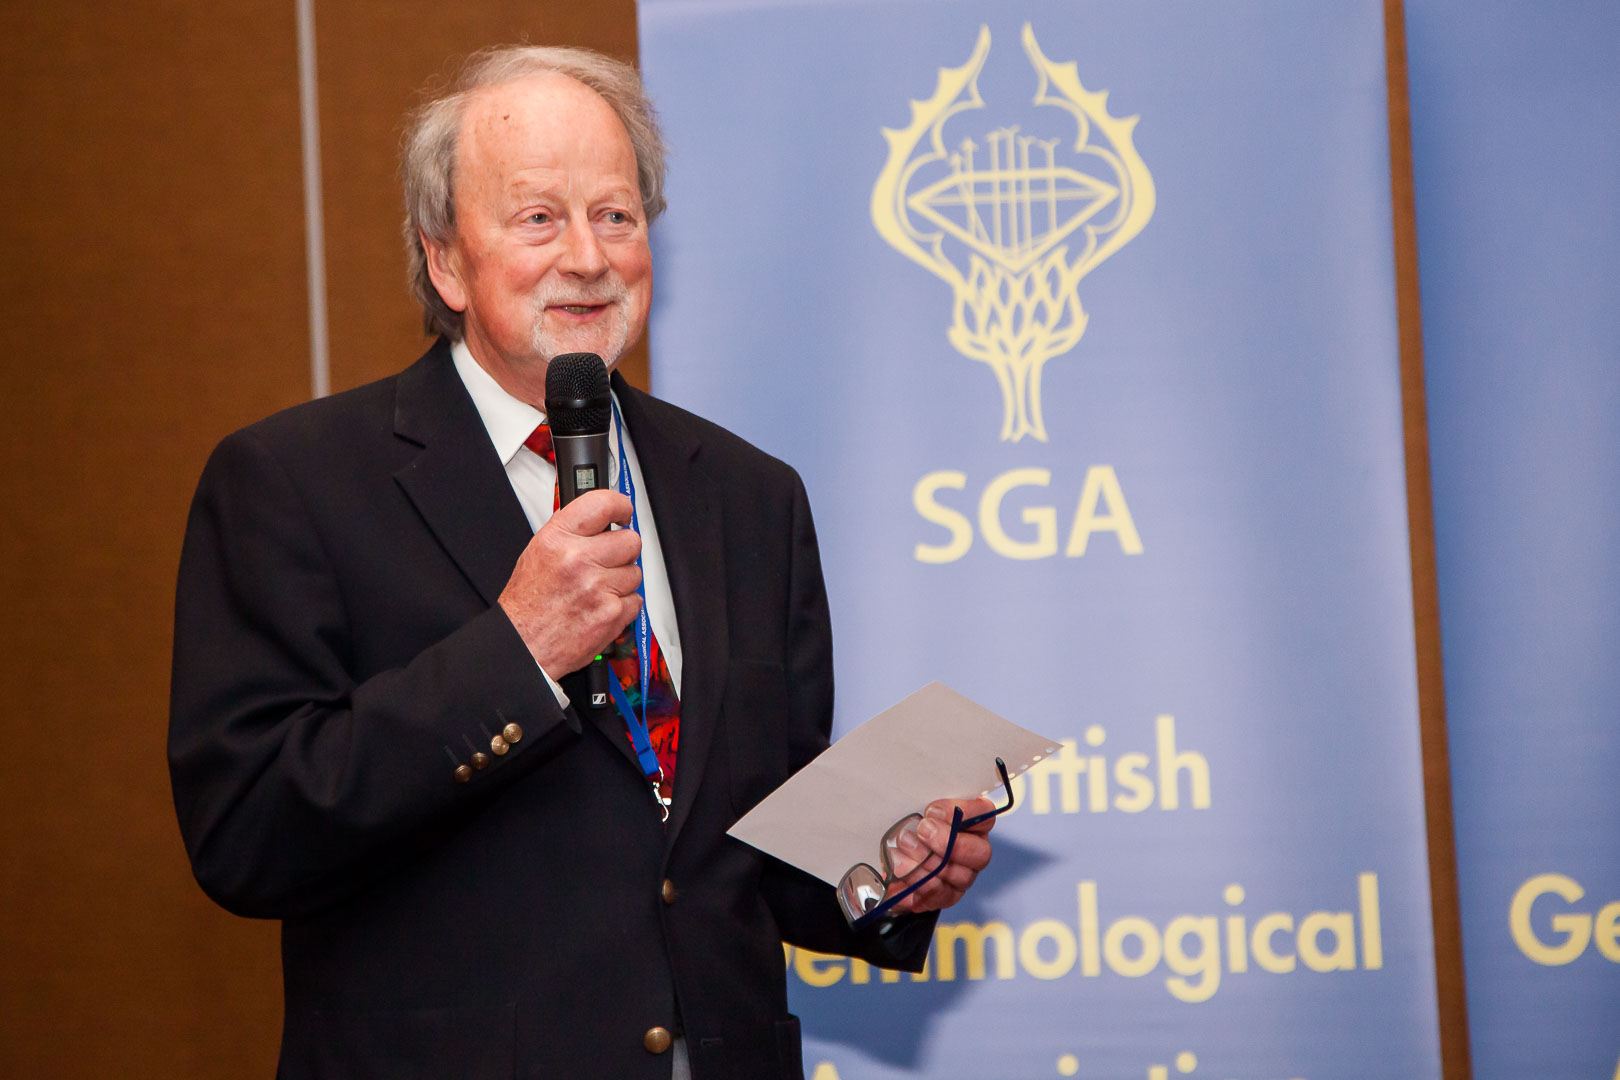 SGA Conference 2019-6506.jpg